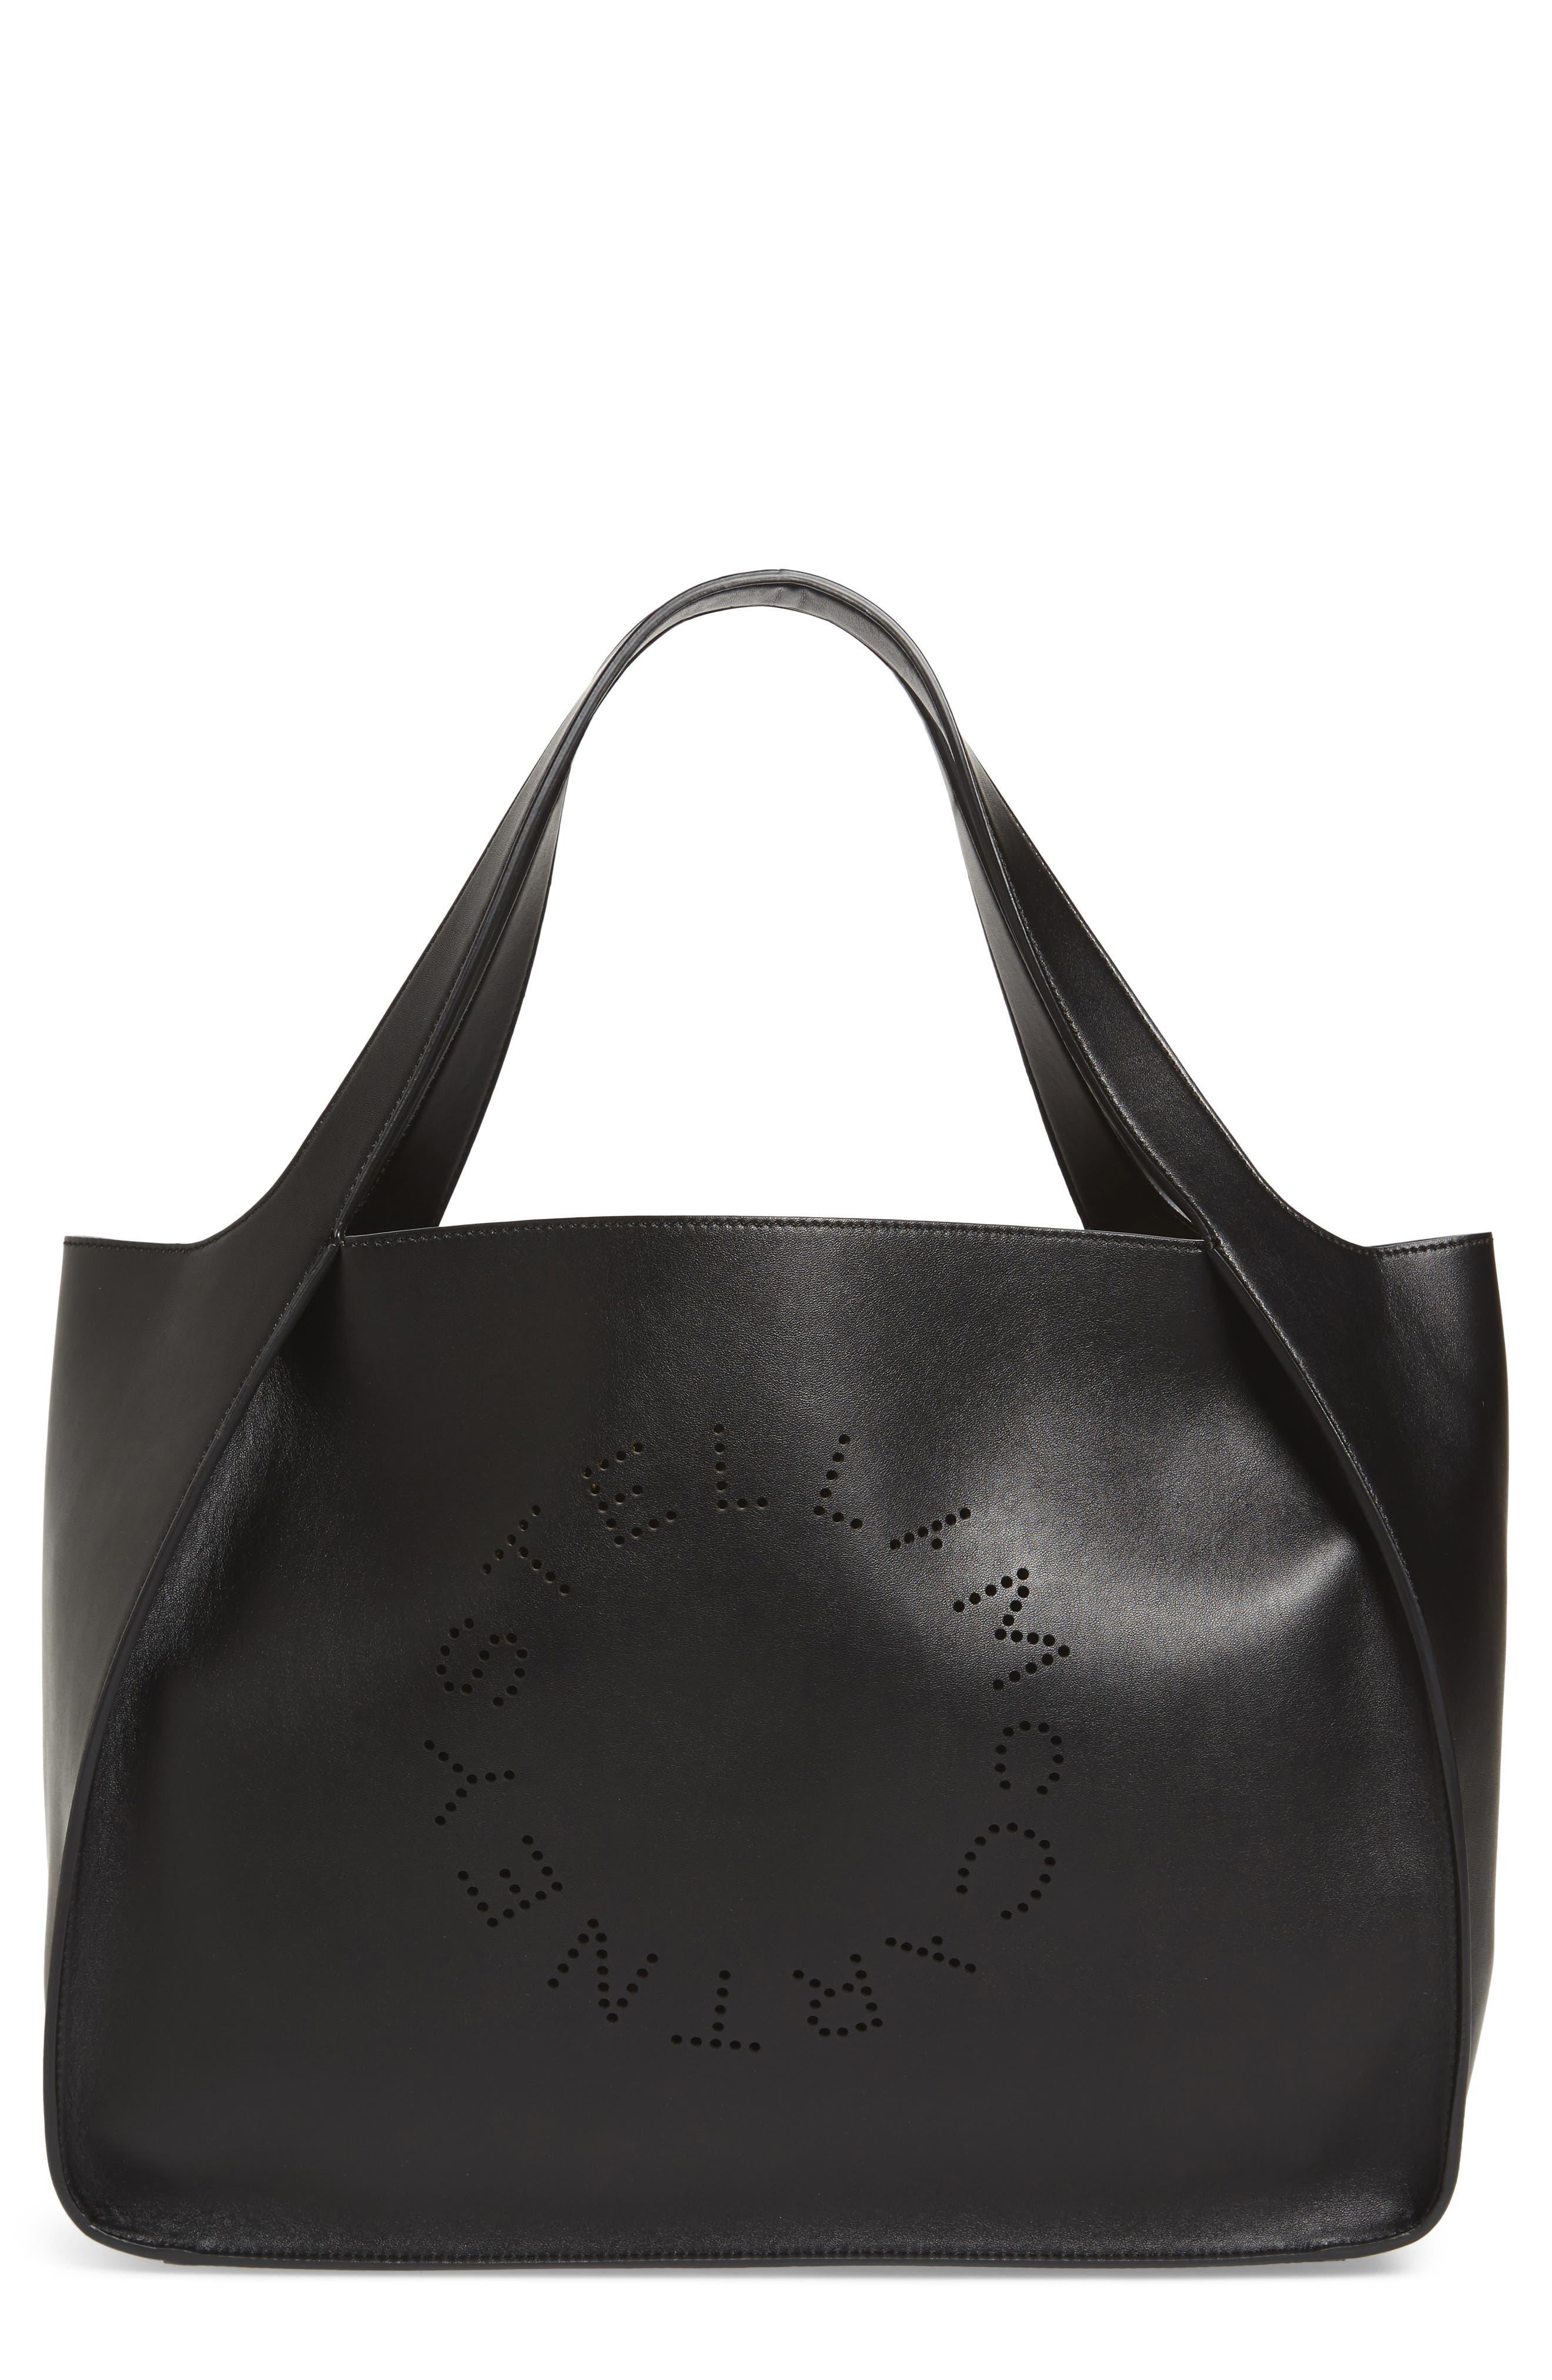 Stella McCartney Women's Handbags & Purses | Nordstrom : stella mccartney quilted bag - Adamdwight.com